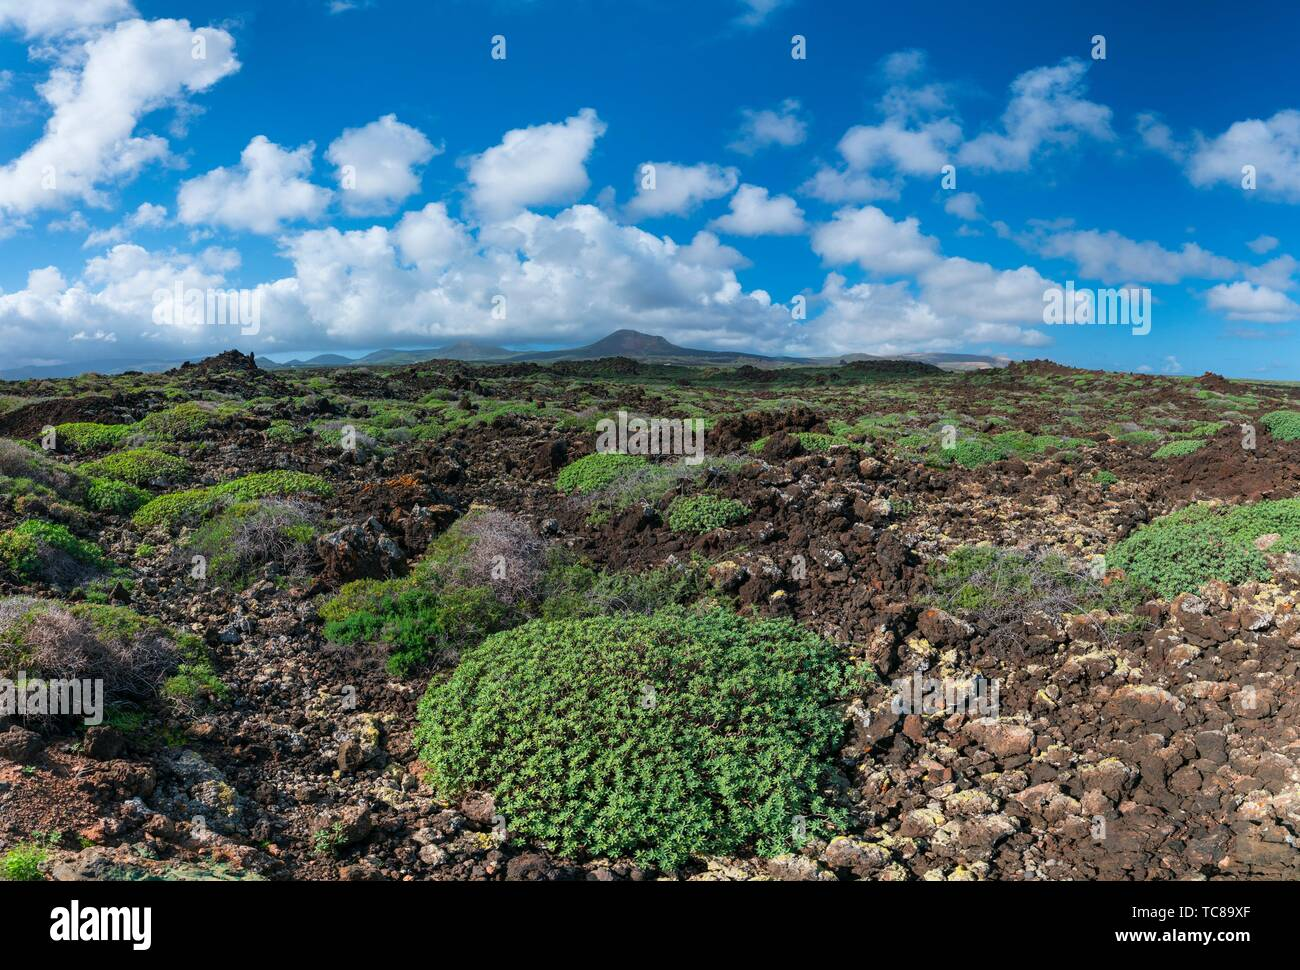 Tabaibas, Malpais de la Corona, Orzola, Lanzarote, Isole Canarie, Spagna, Europa. Immagini Stock